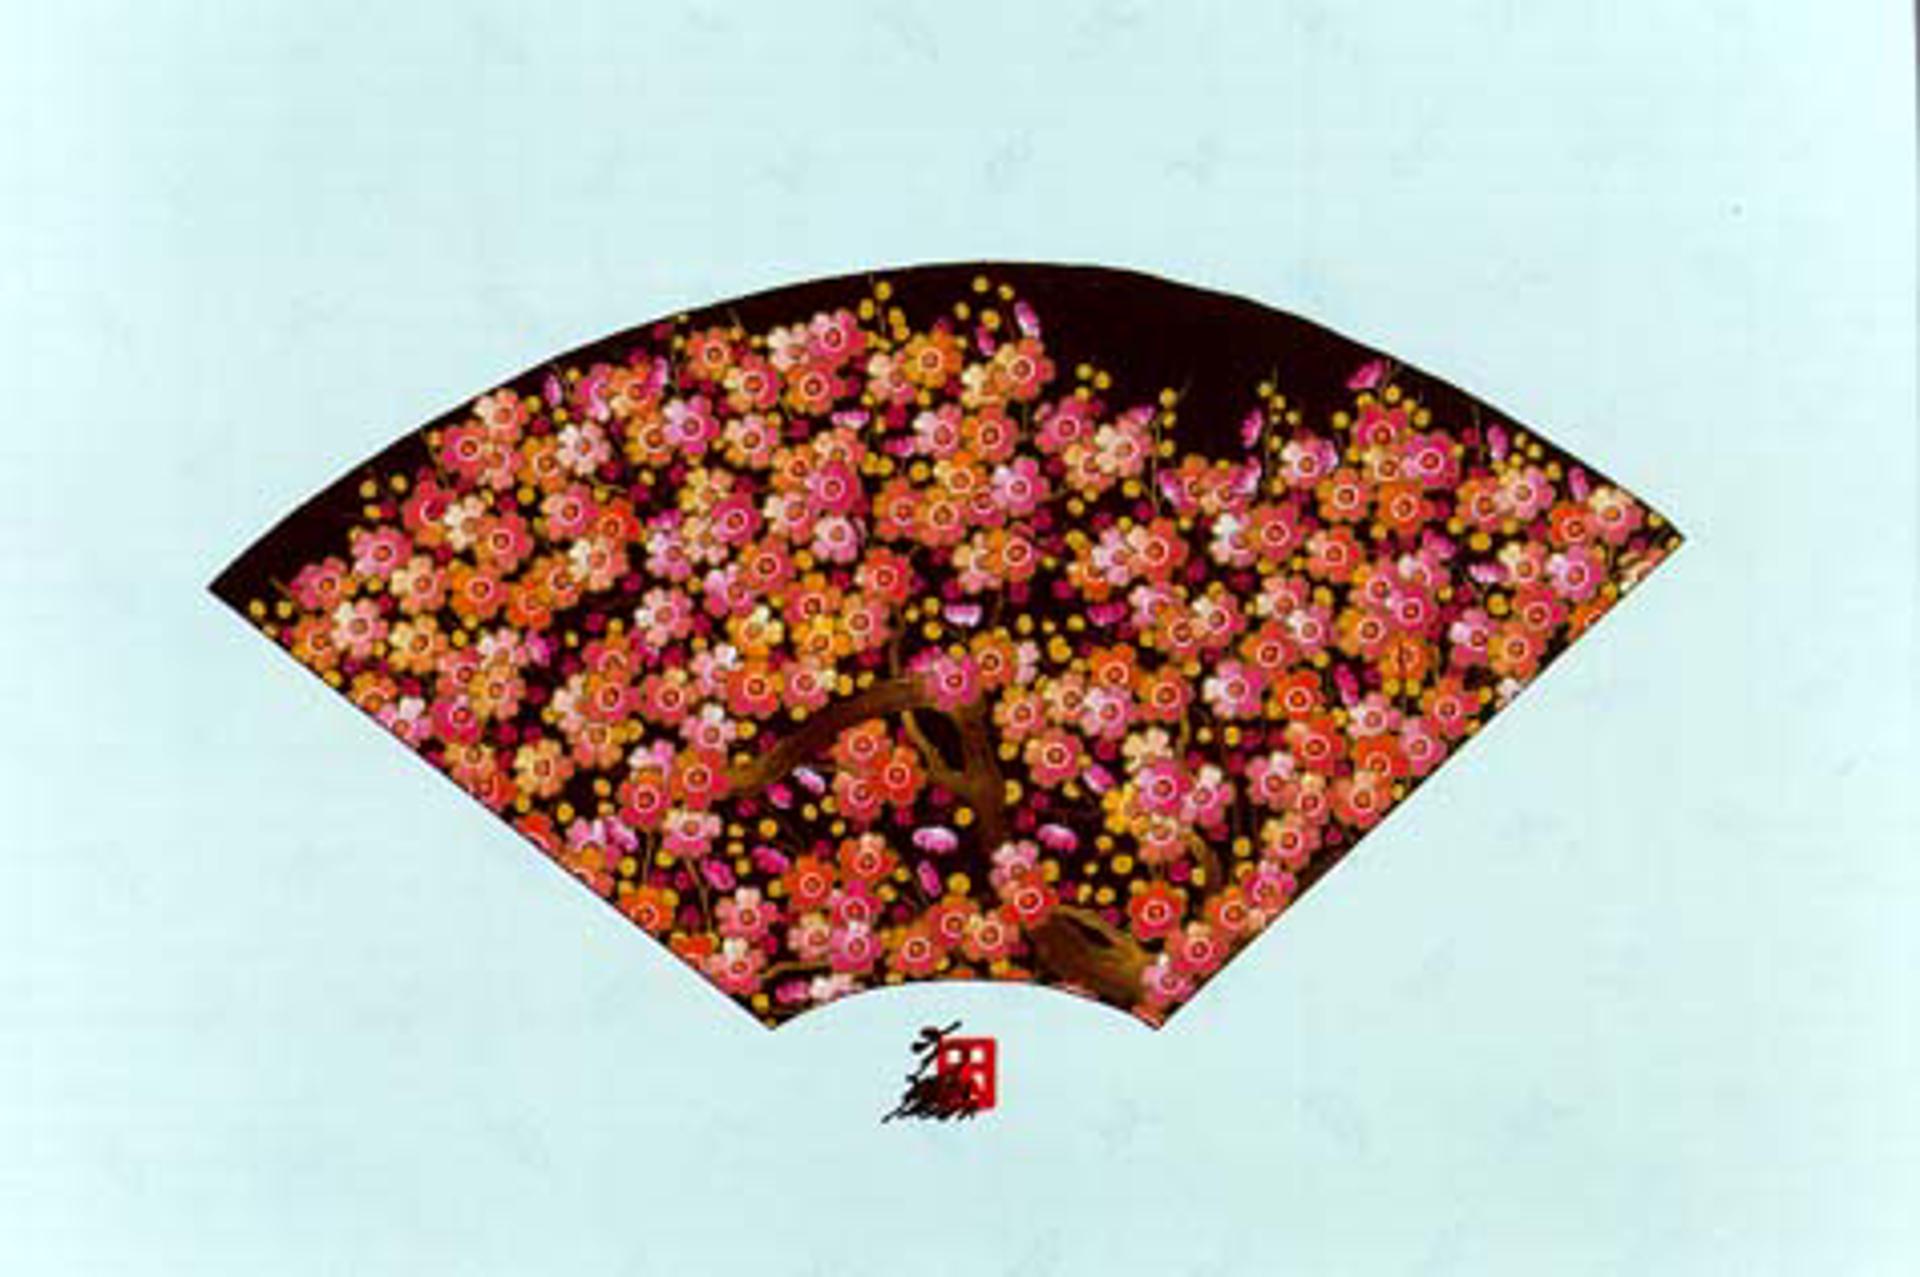 Fan W/ Plum Blossoms by Hisashi Otsuka